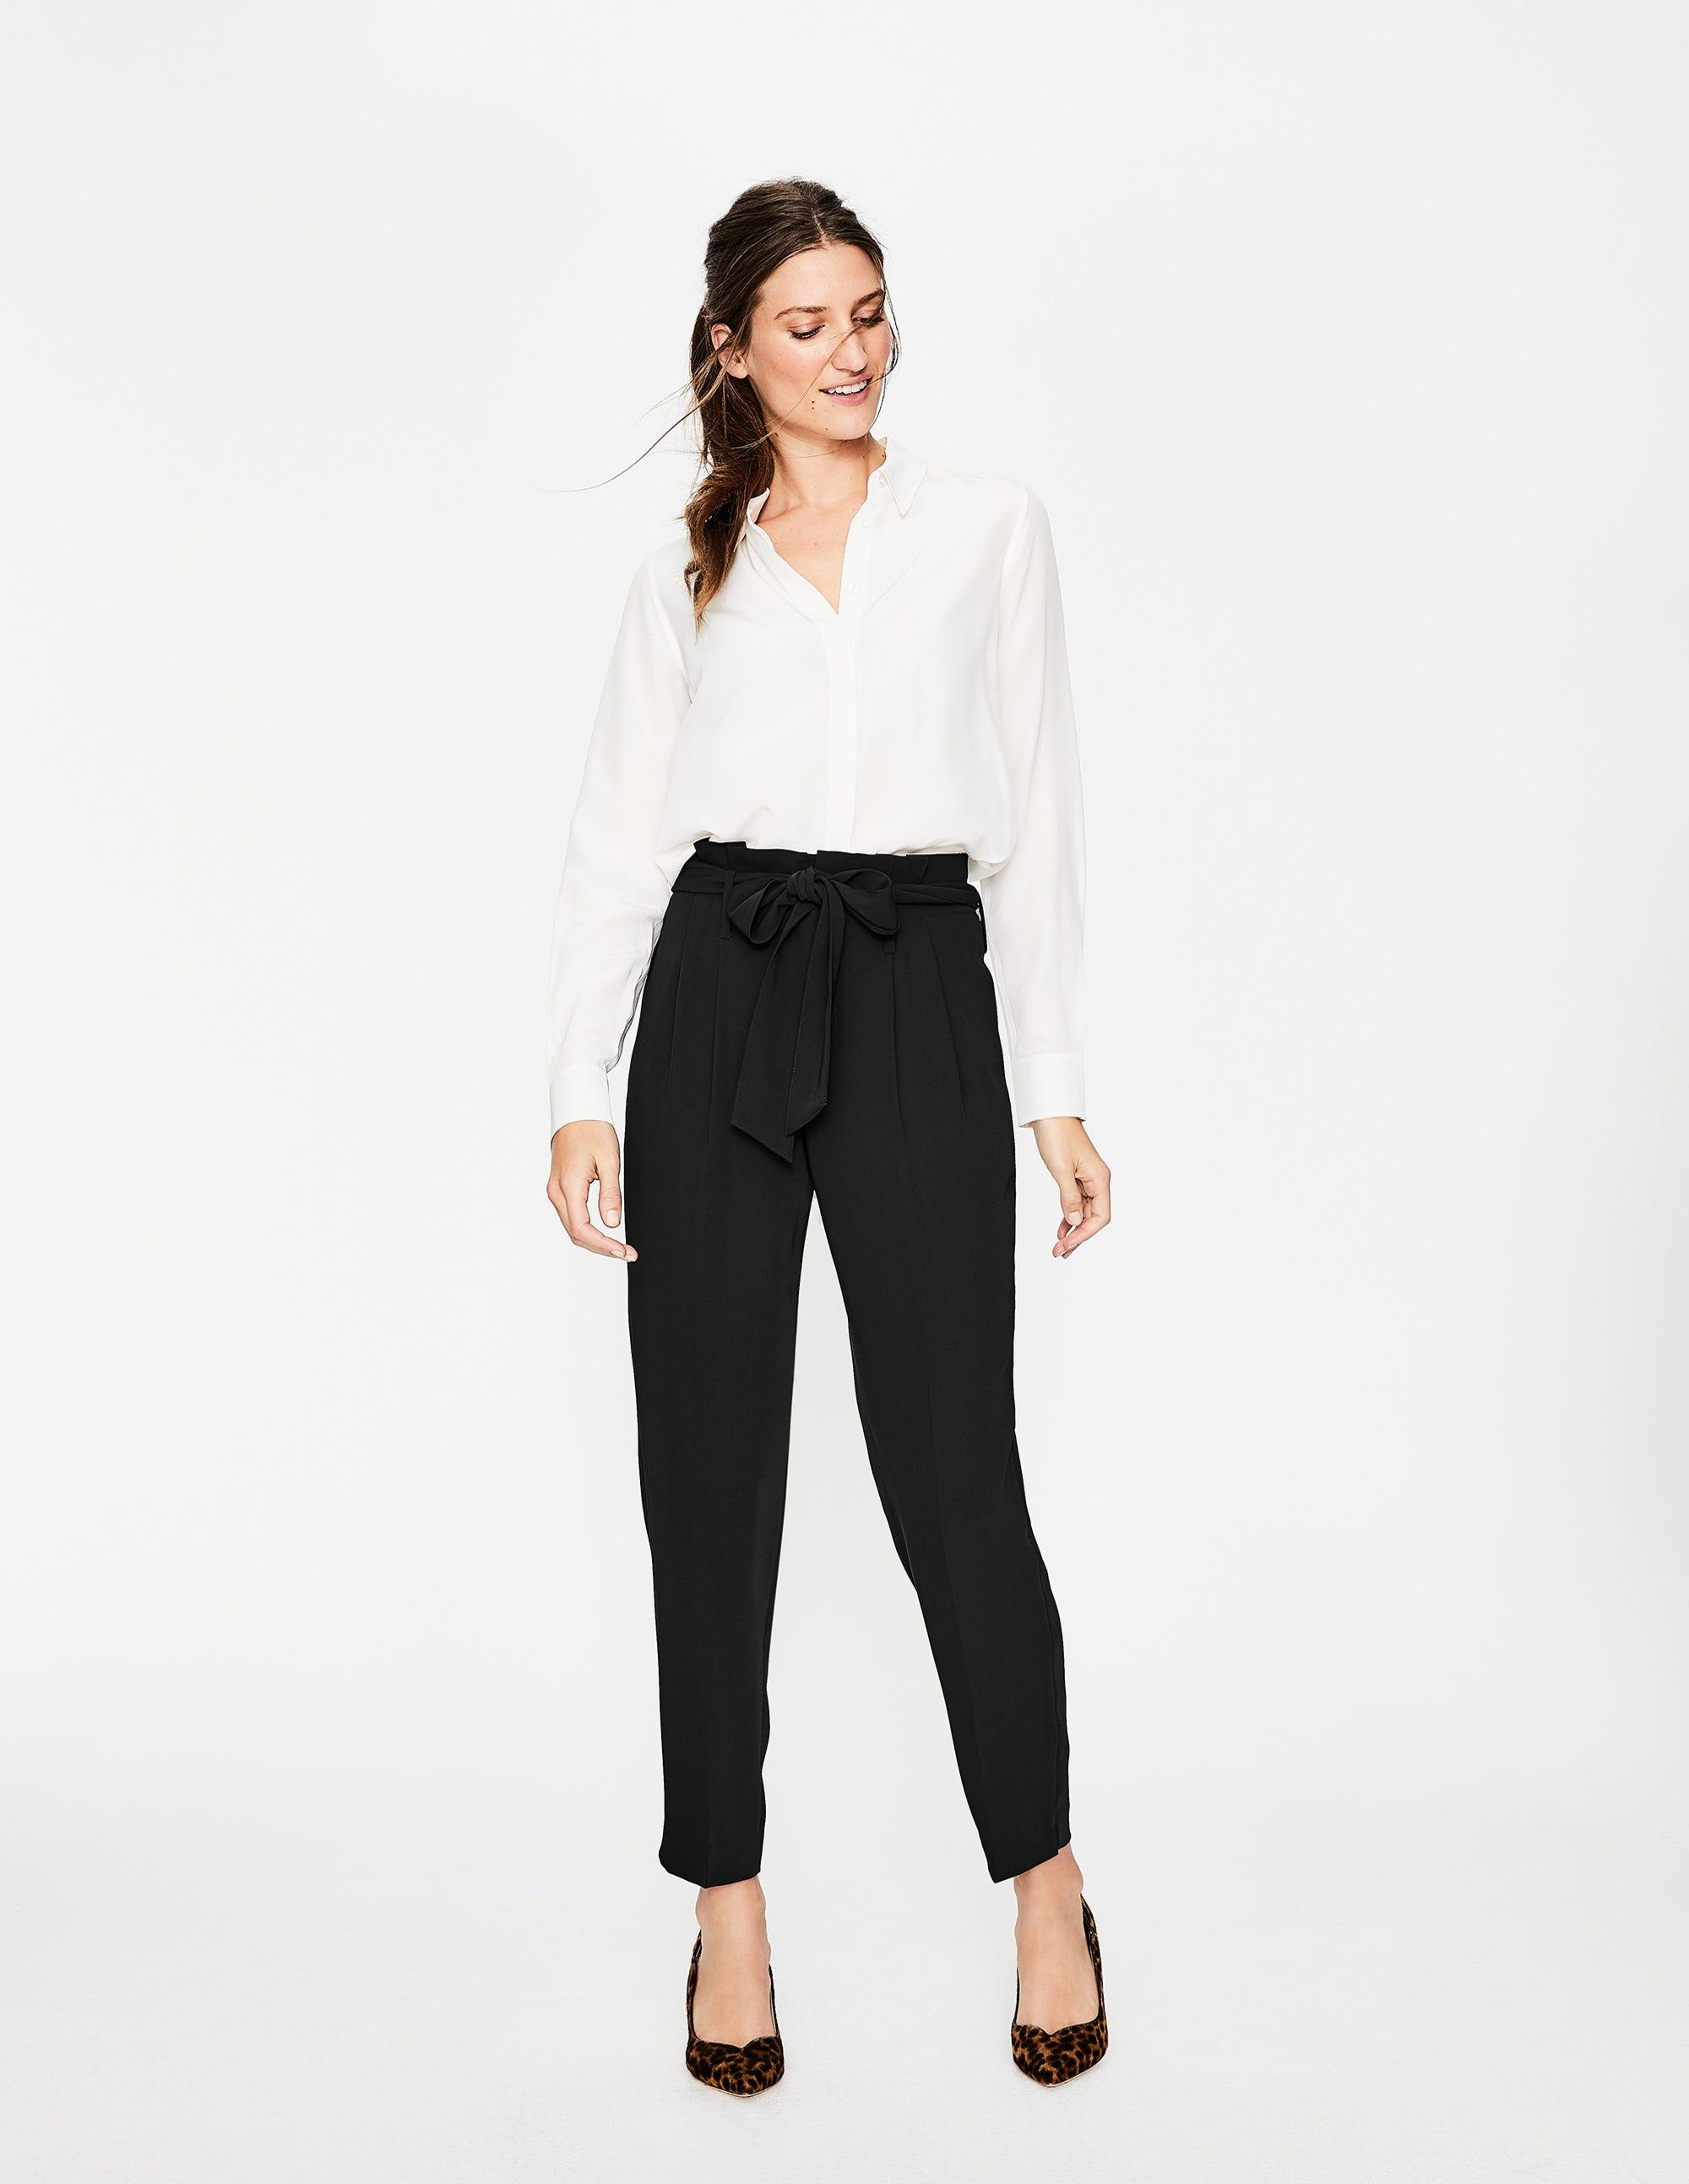 Pantalon Melina taille haute Black Femme Boden